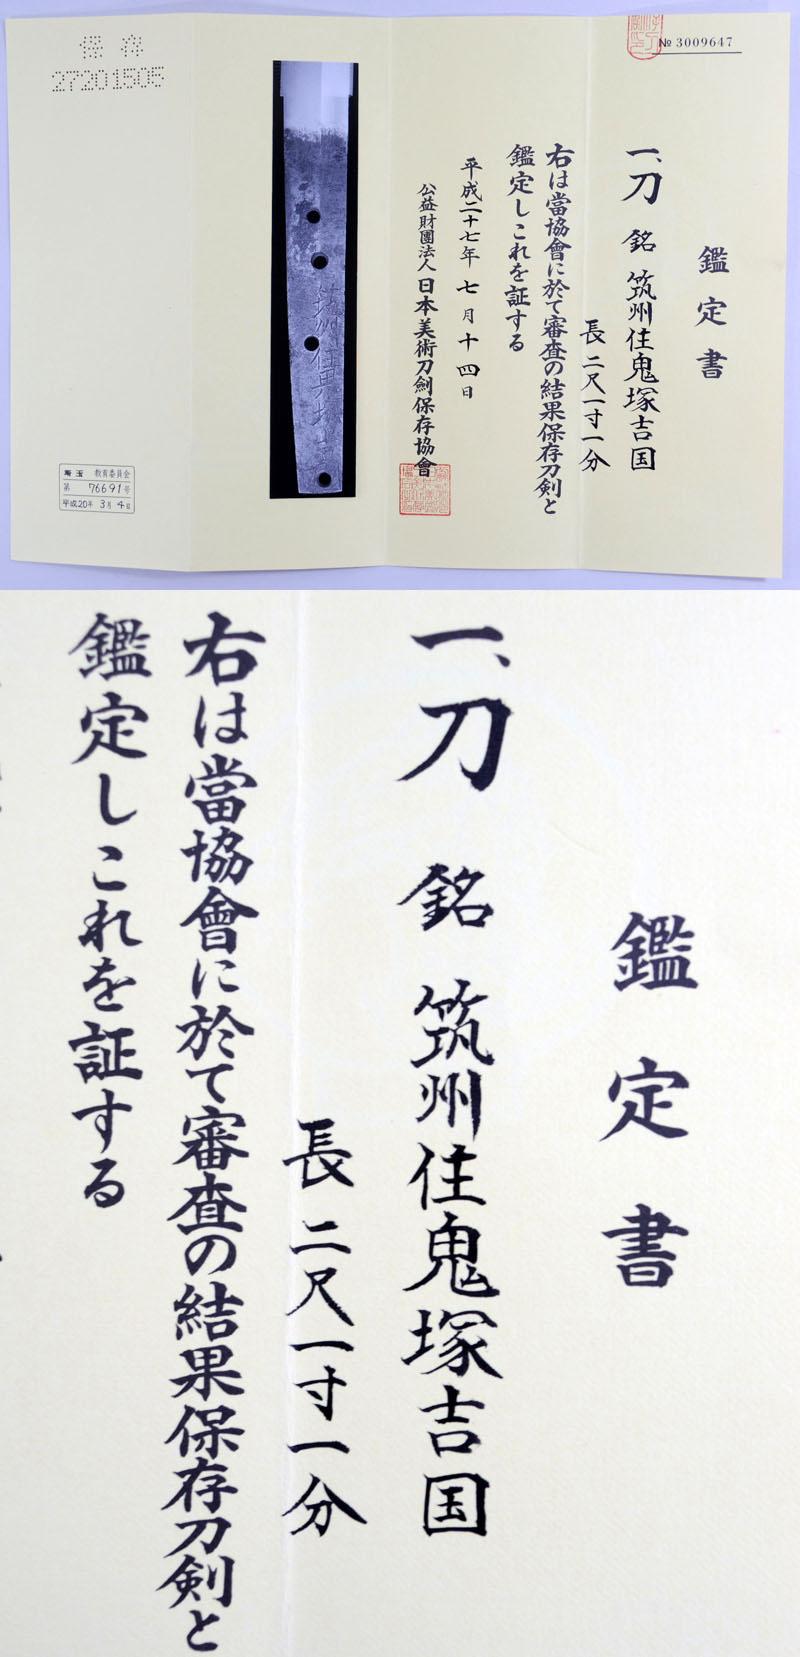 筑州住鬼塚吉国 Picture of Certificate